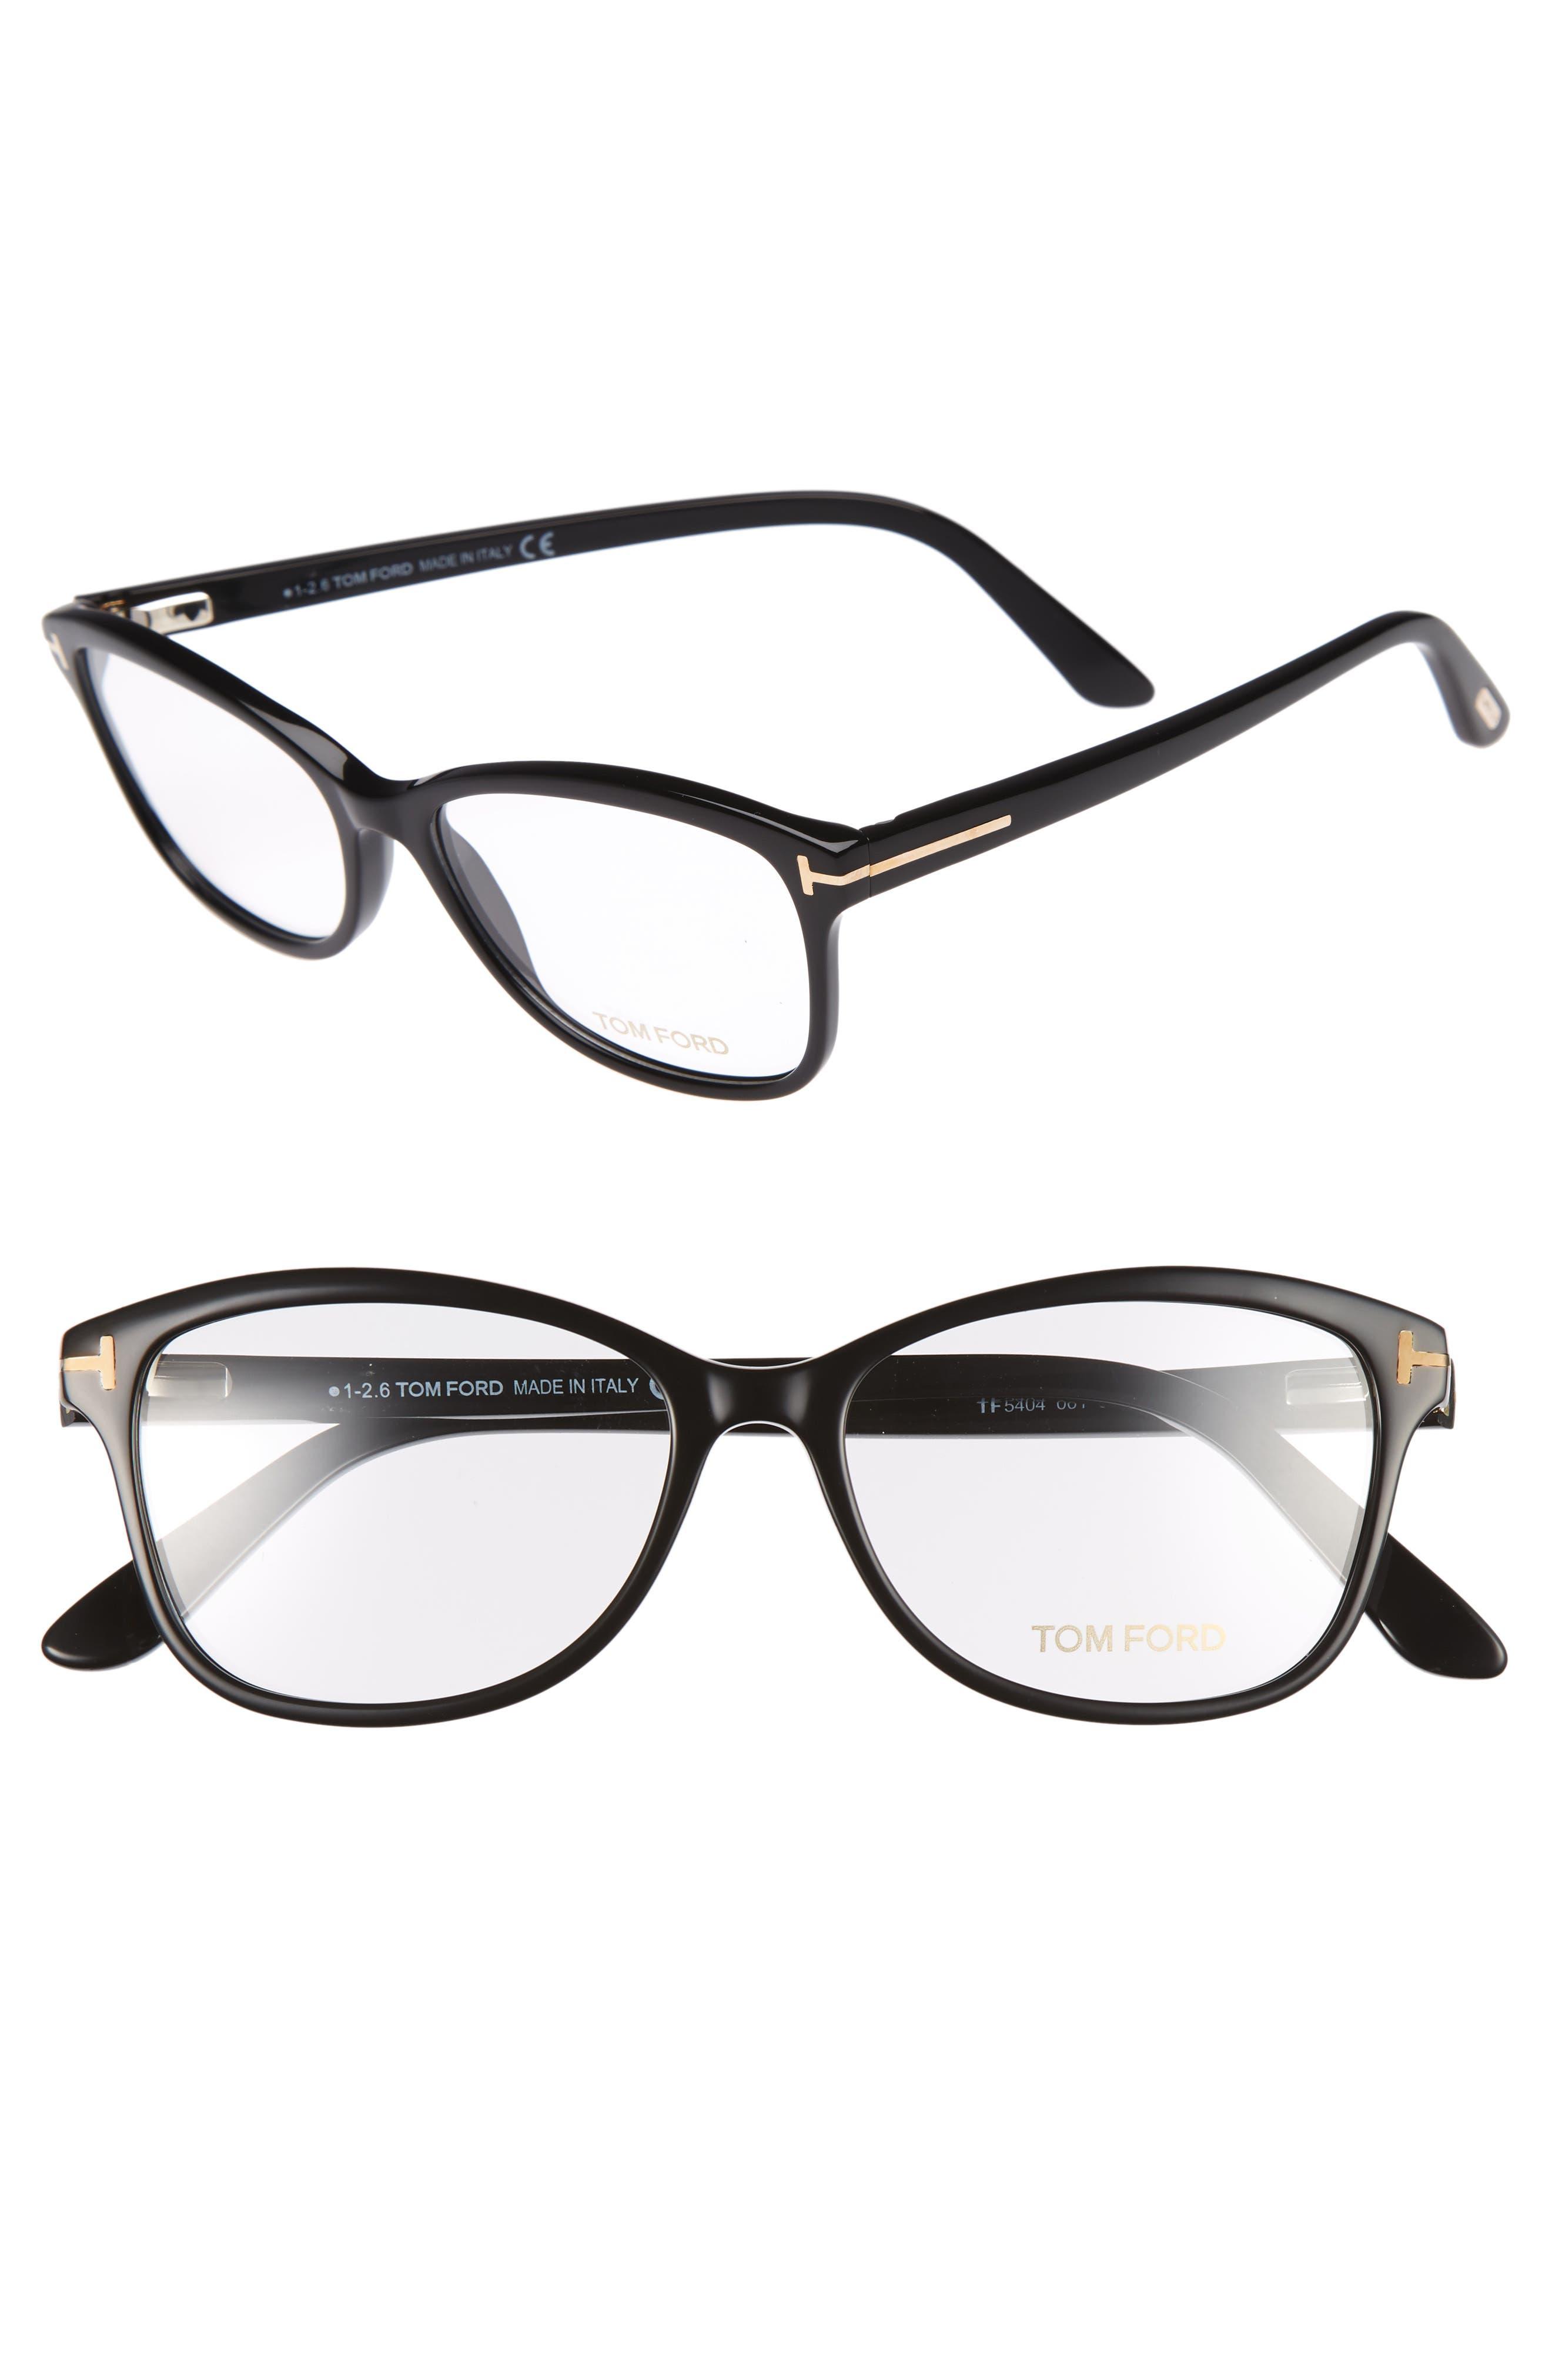 7330a8a3221 designer eyeglasses